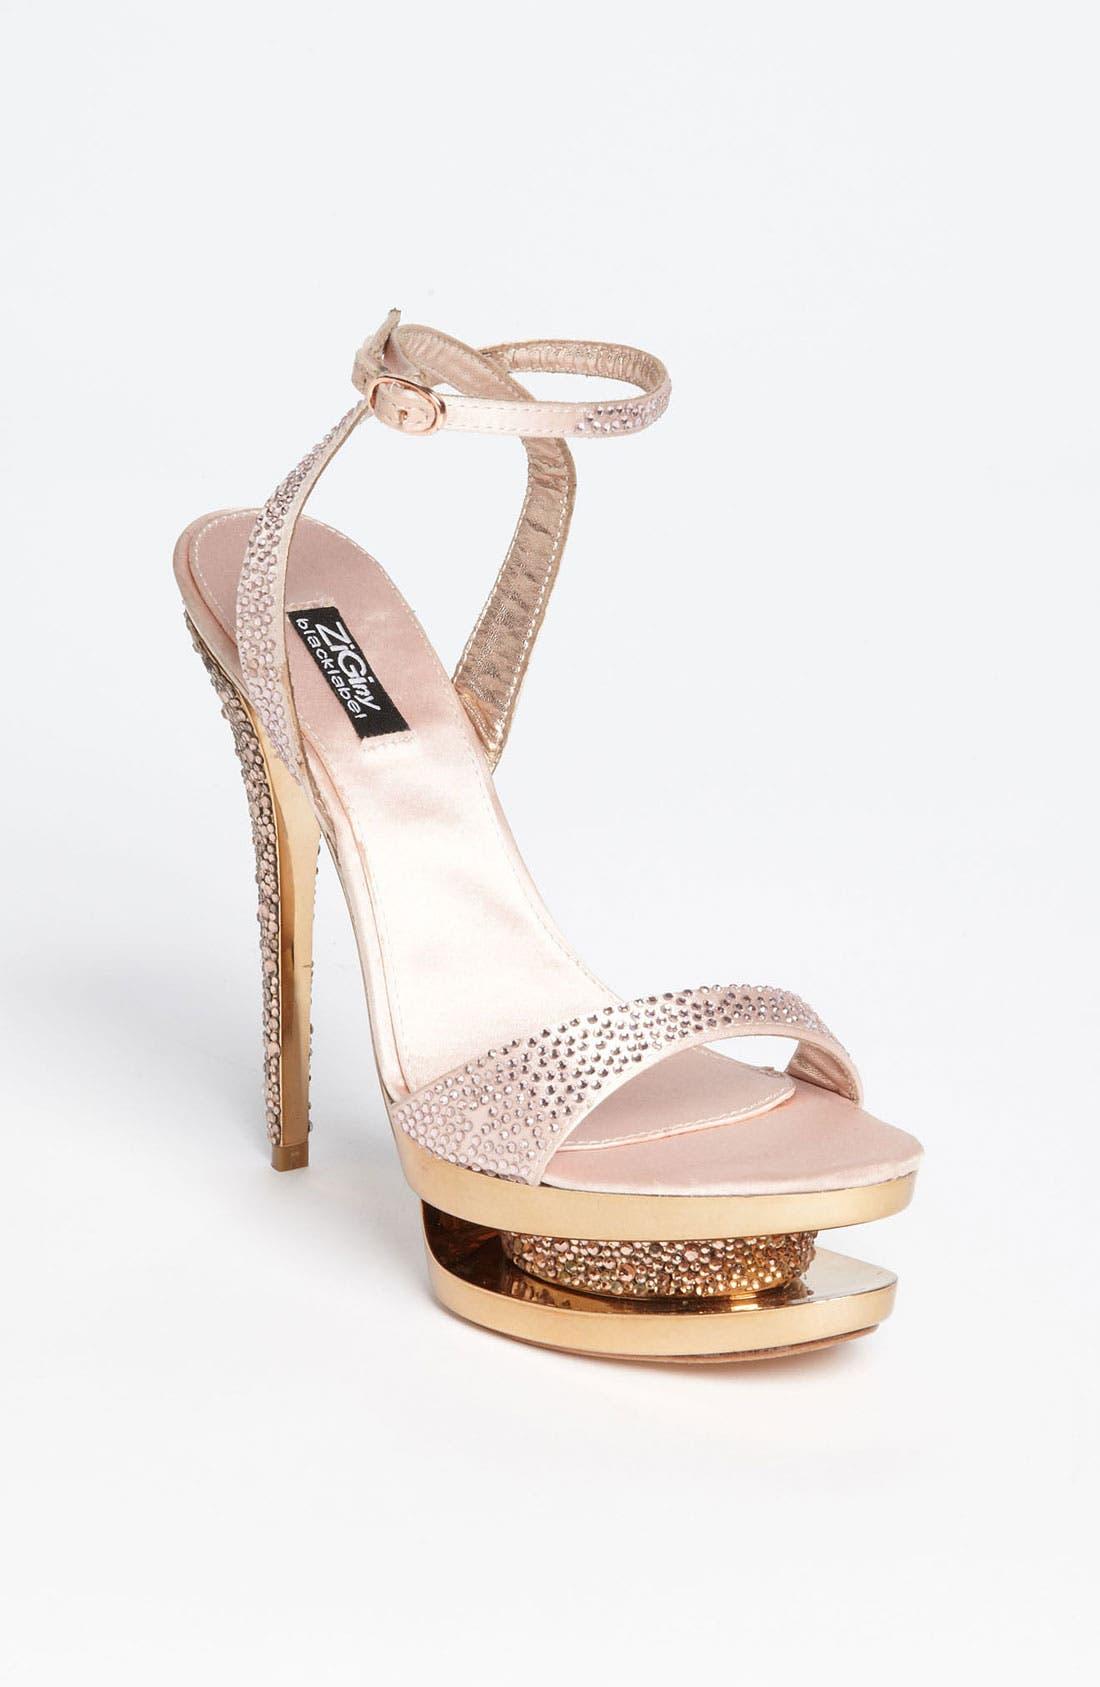 Main Image - ZiGiNY Black Label 'Sparkler' Sandal